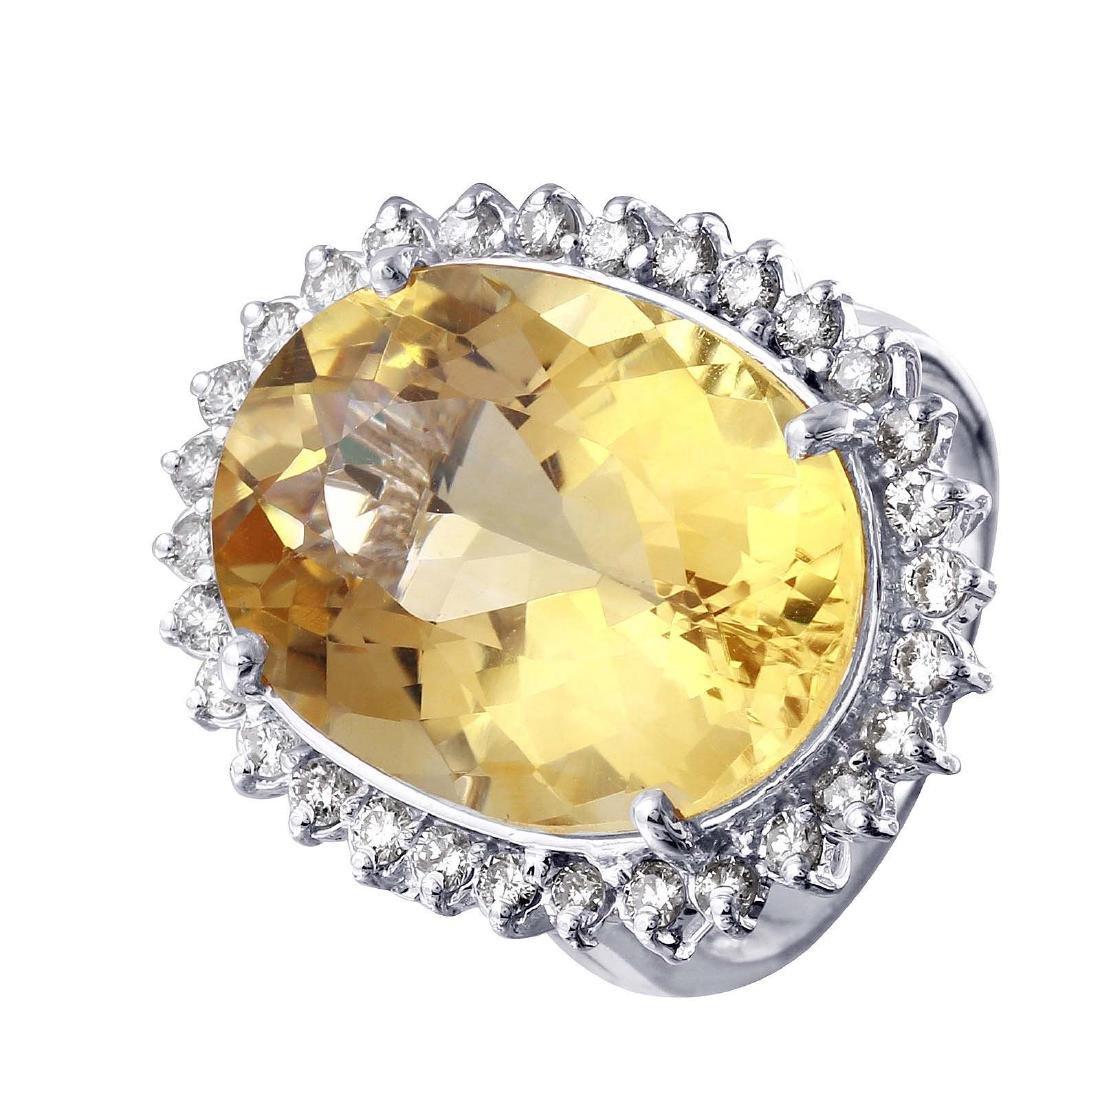 14KT White Gold Citrine and Diamond Cocktail Ring